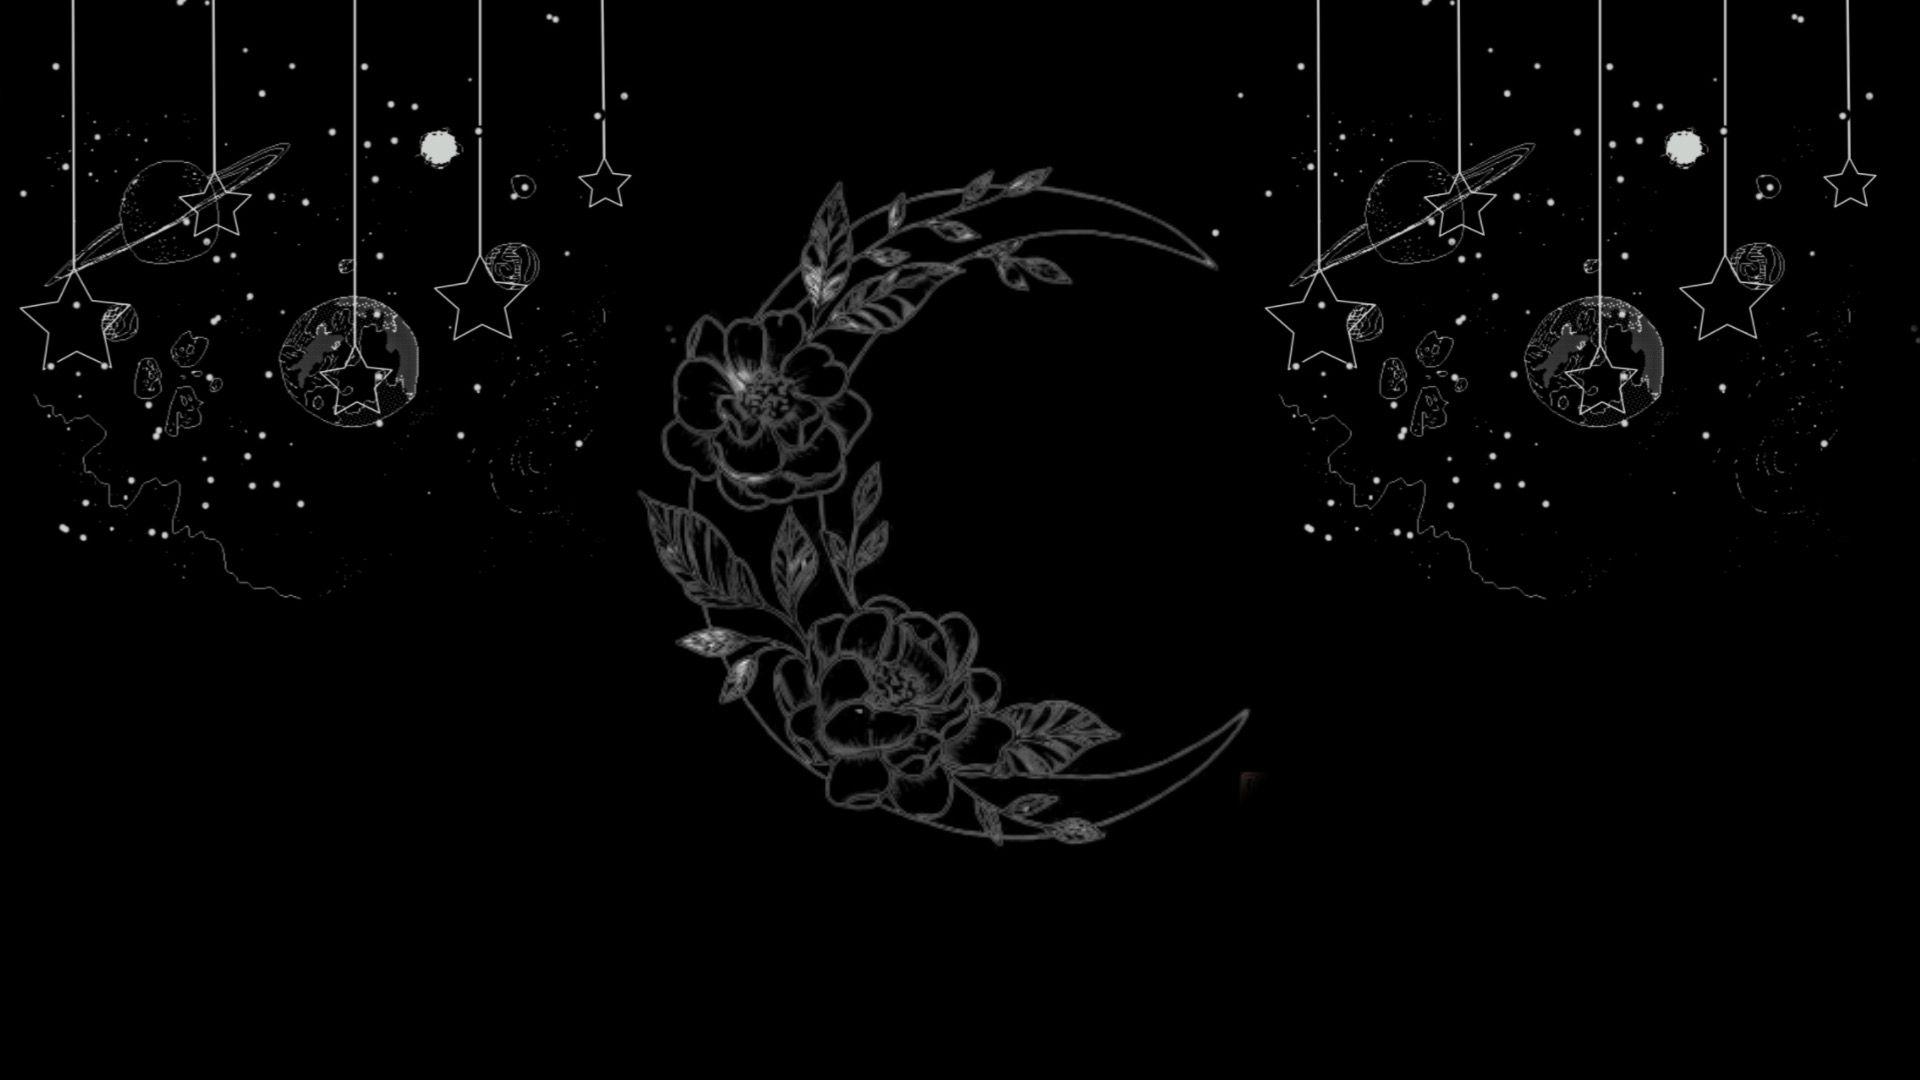 Resultado De Imagen De Moon Drawing Tumblr Black Background Black Wallpapers Tumblr Hipster Wallpaper Tumblr Wallpaper